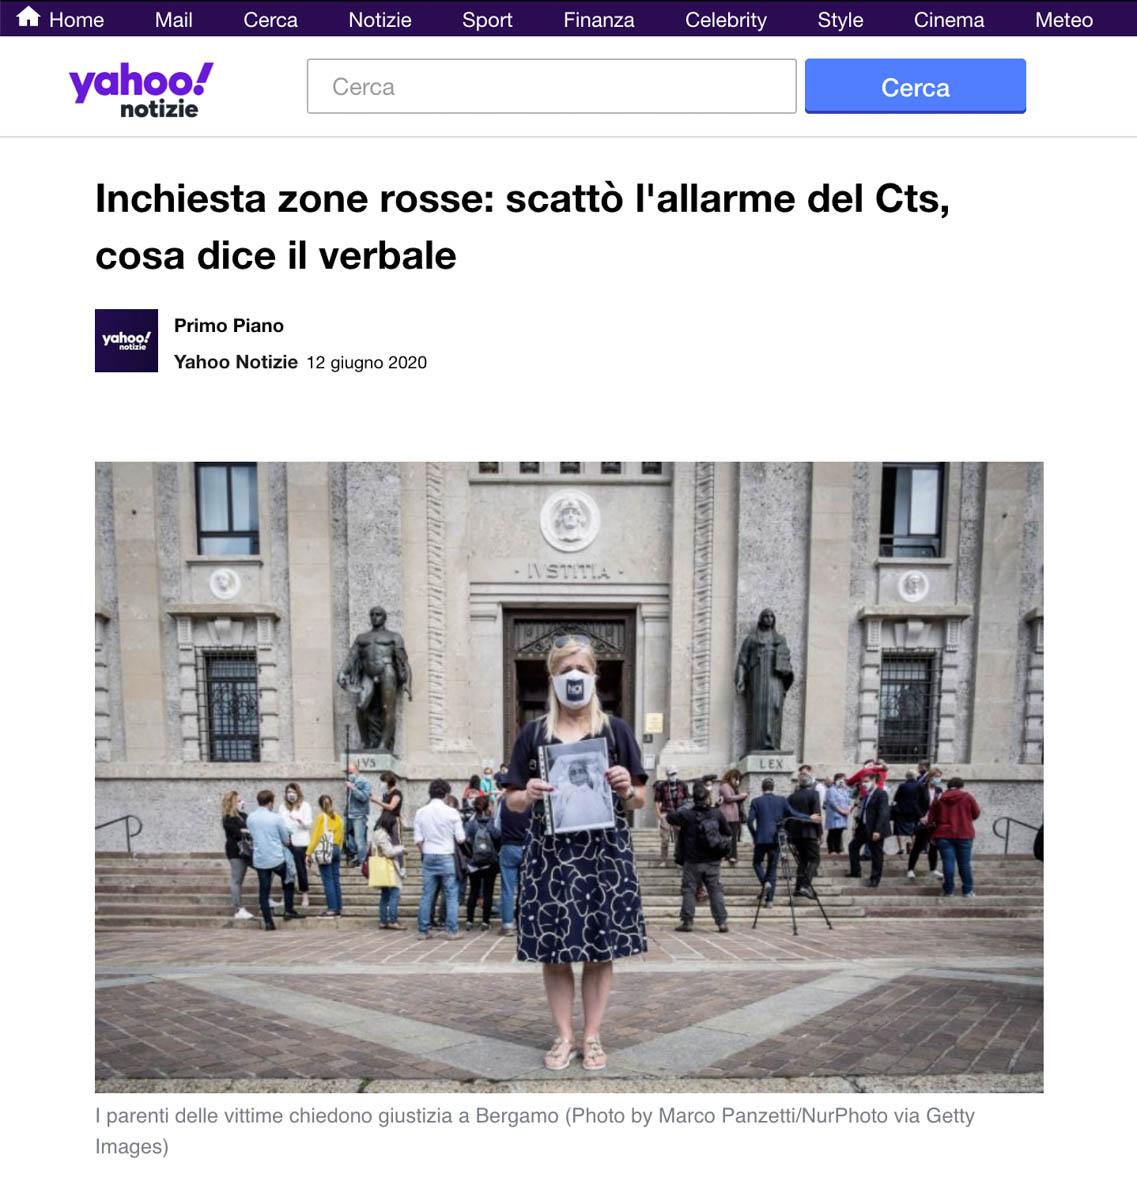 Publication on Yahoo News